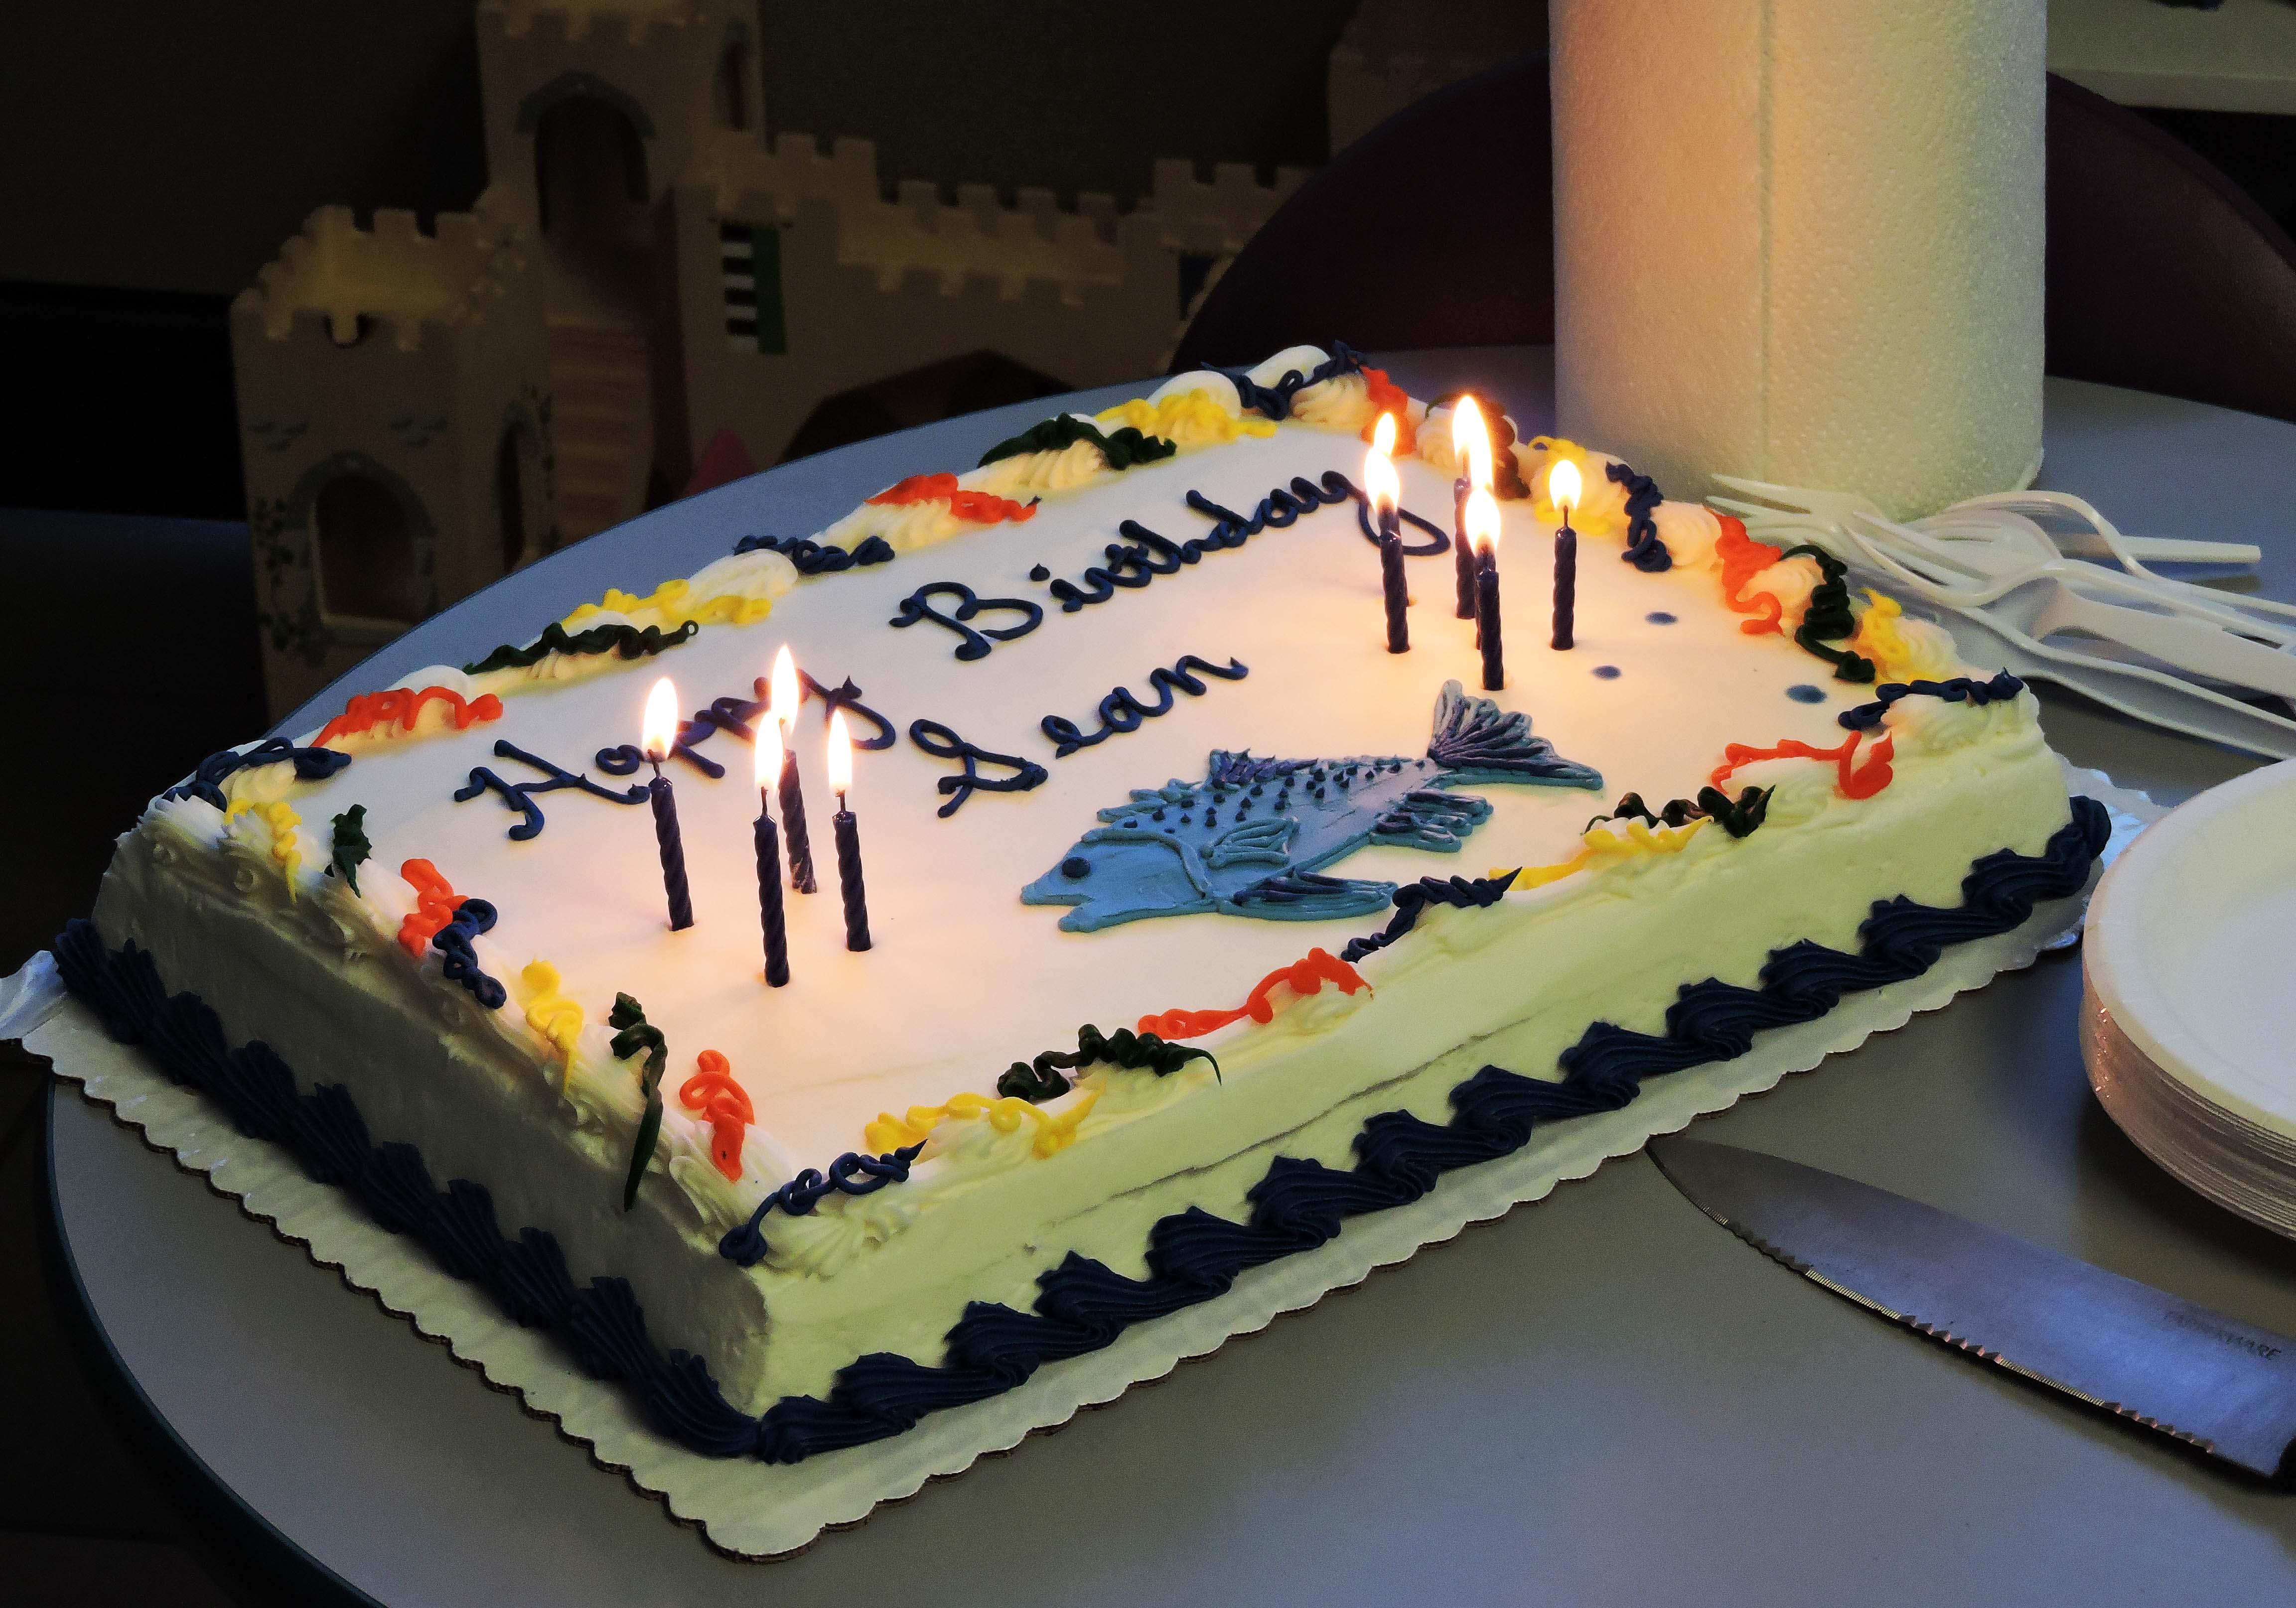 Bertera Subaru West Springfield >> Happy Birthday Sean! - Bertera Auto Group Blogs